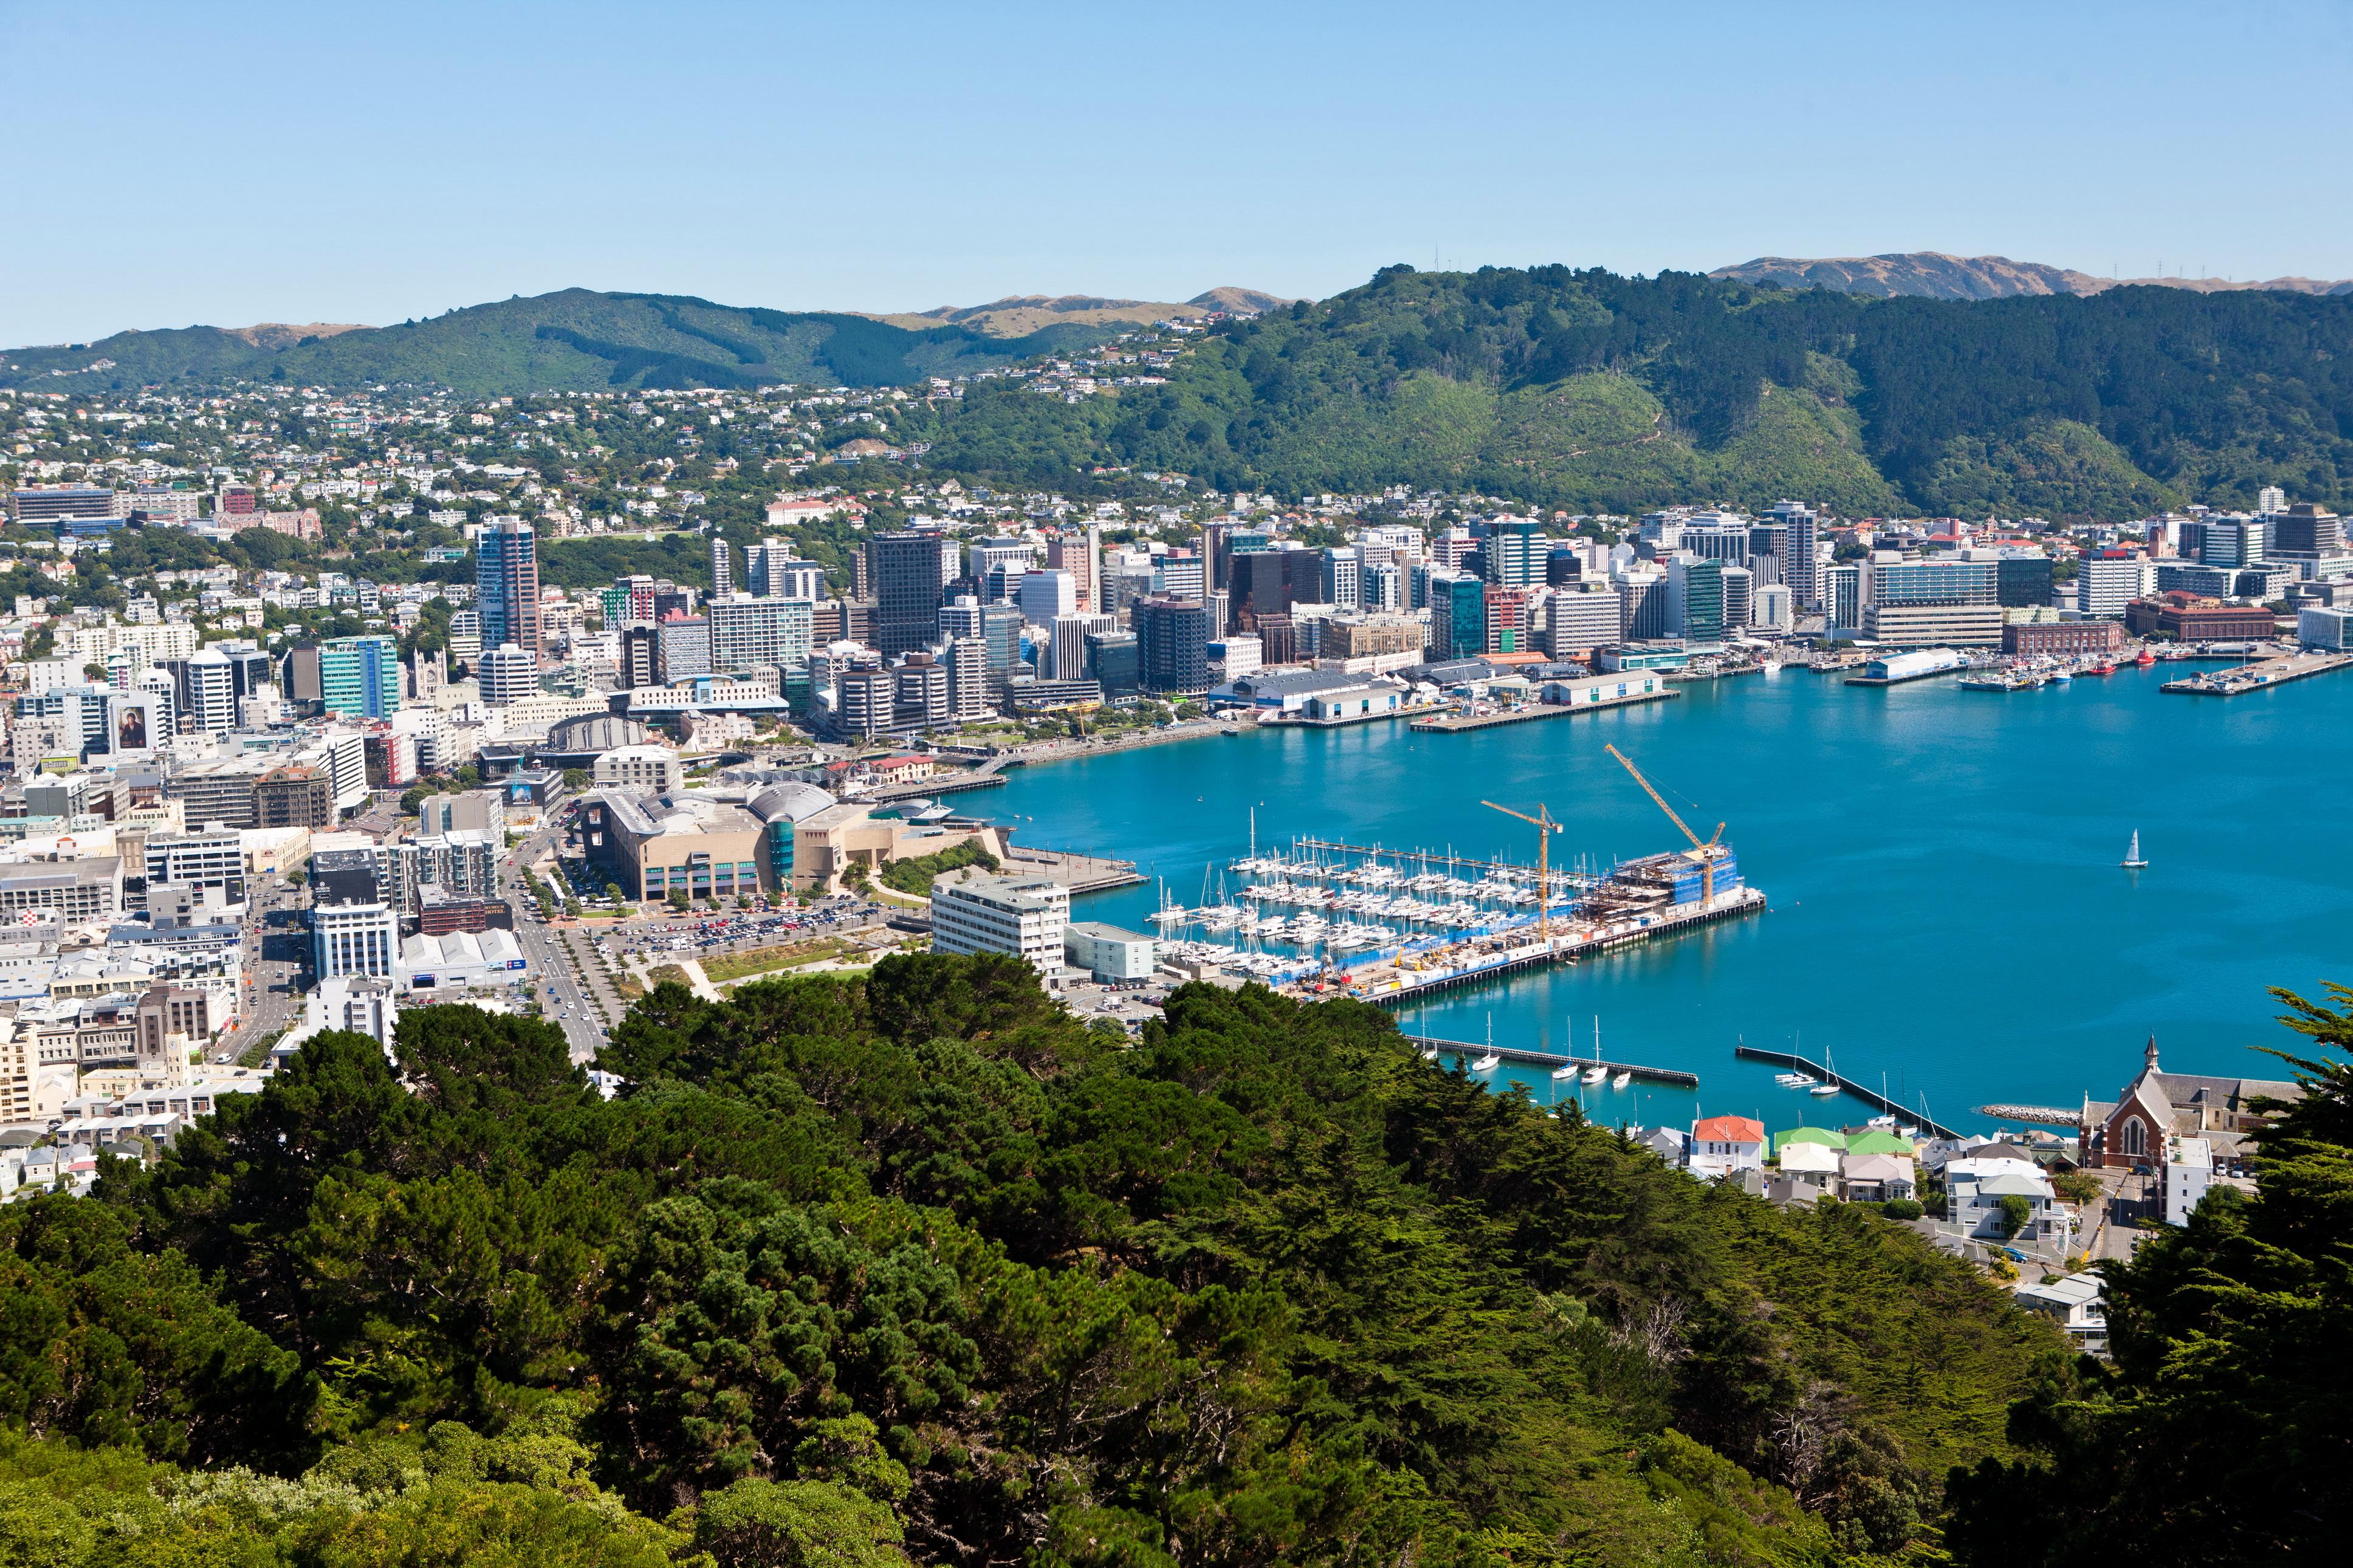 Images New Zealand Wellington Coast Marinas From above 3872x2581 3872x2581